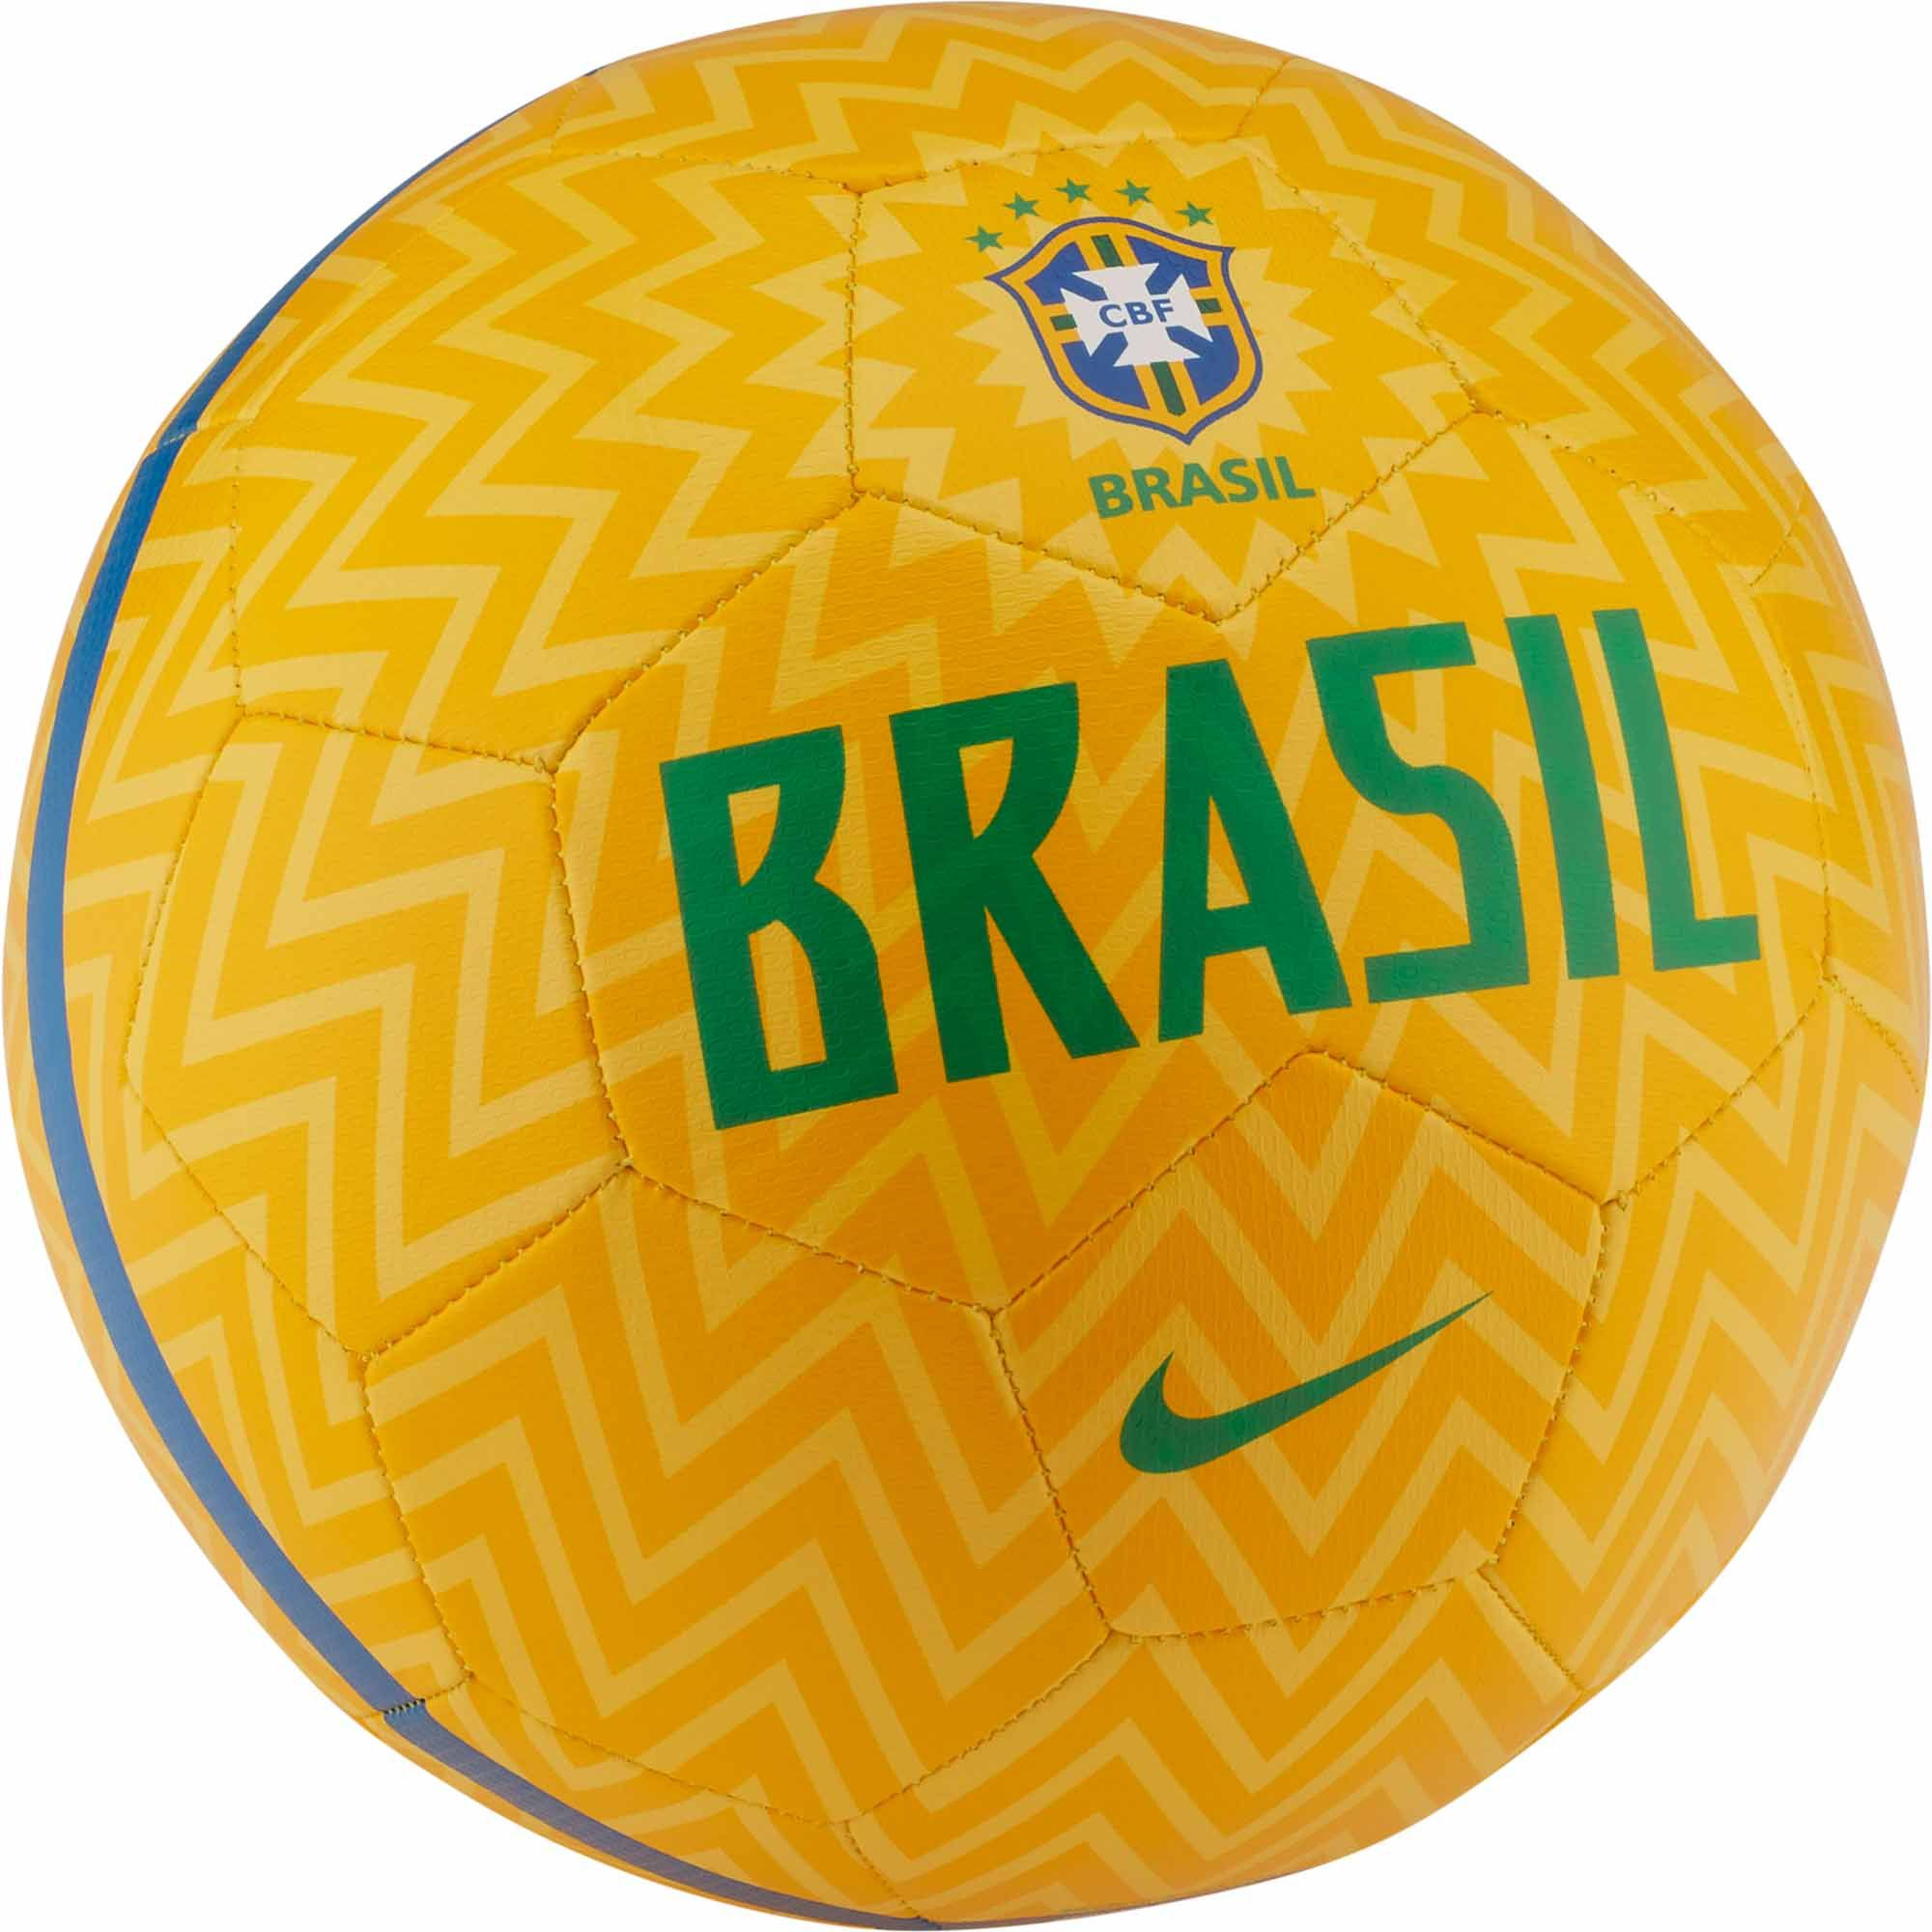 Nike Brazil Prestige Soccer Ball. Get it from SoccerPro. 940fa3200b42a